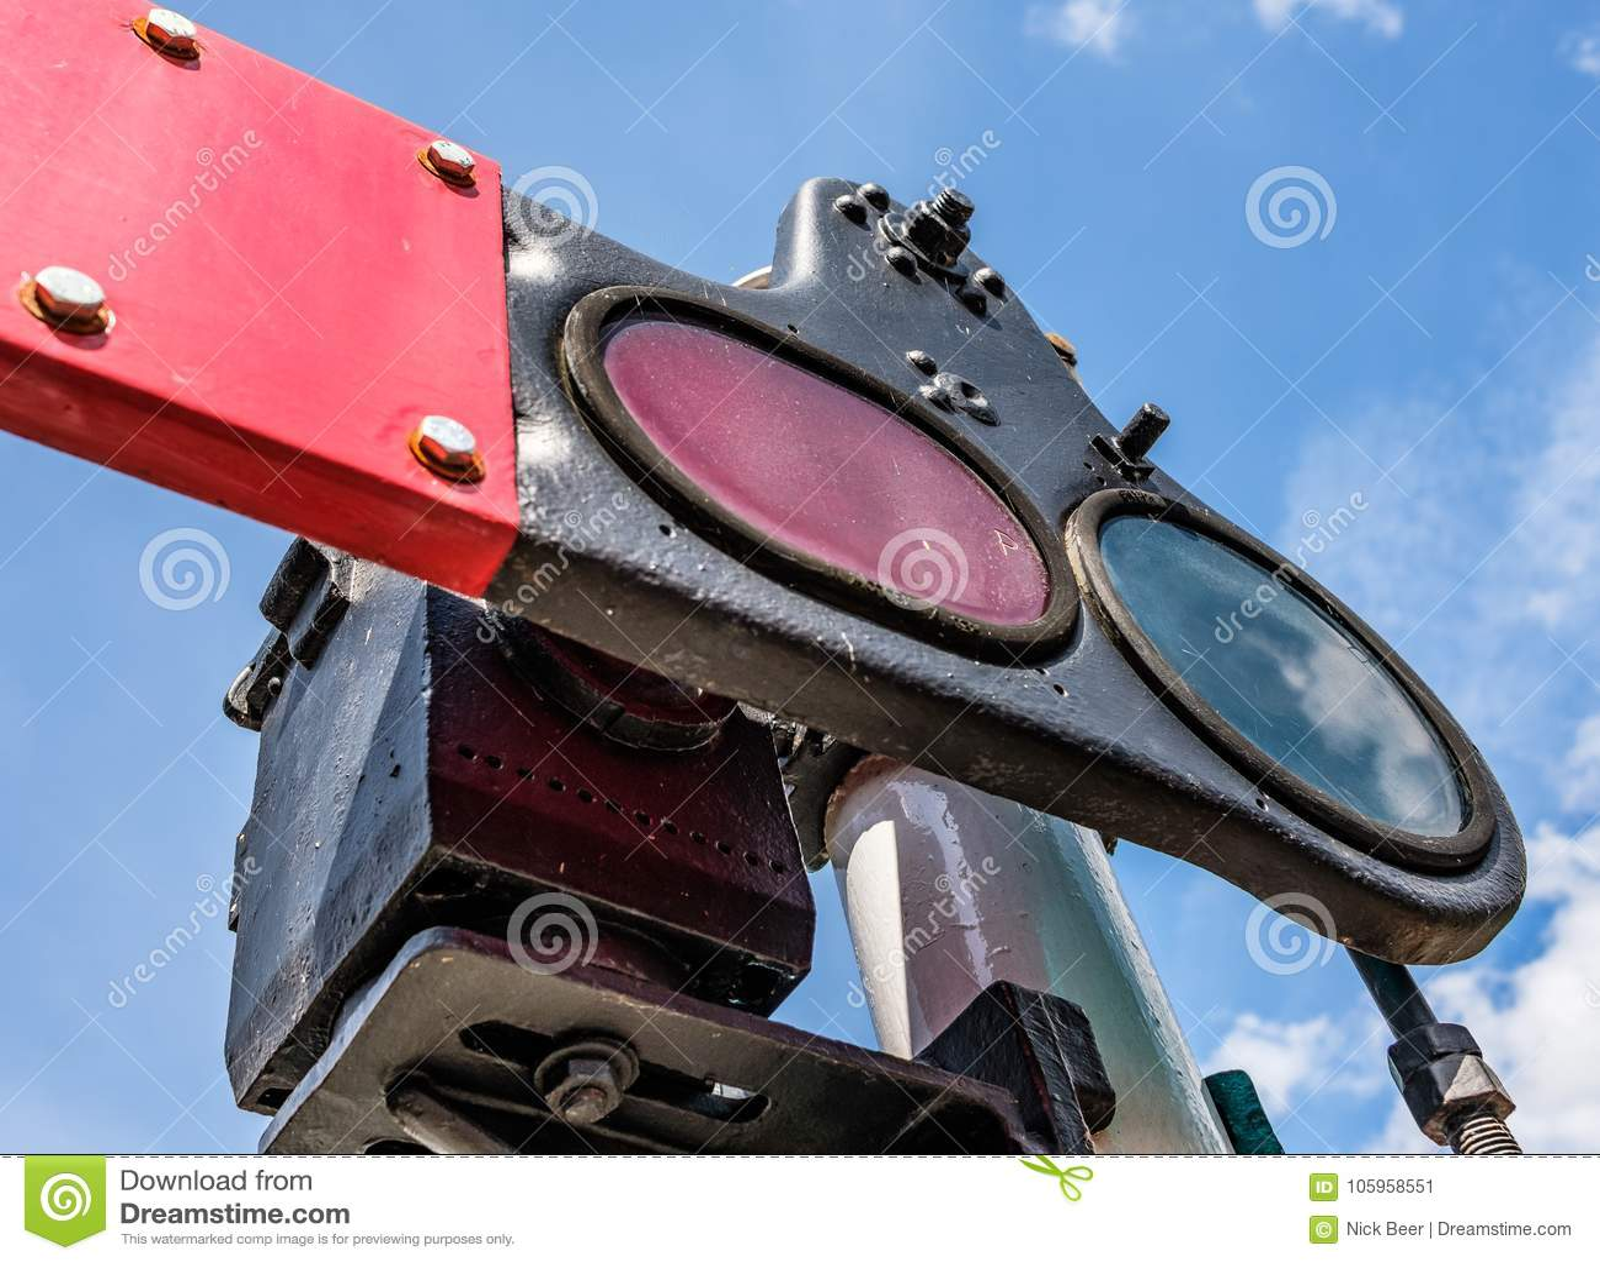 Steam Era Railway Signals Seen At A Railway Junction In The UK